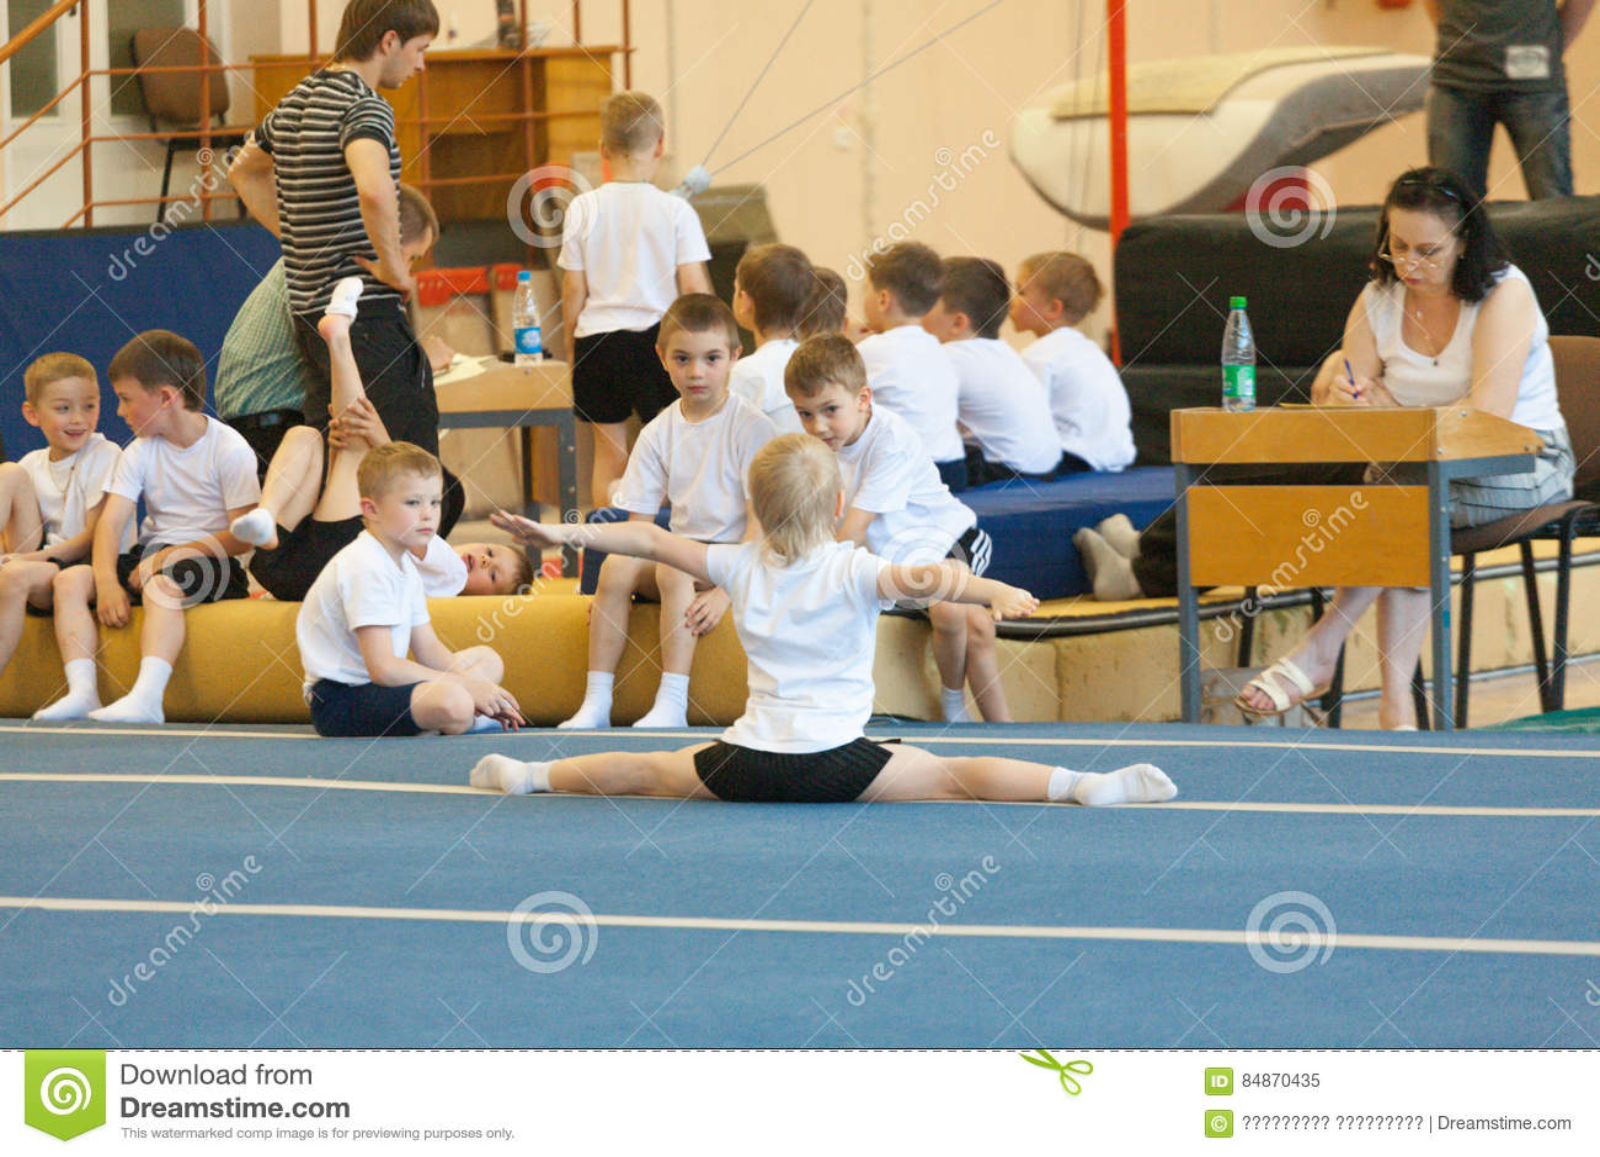 Gomel, Λευκορωσία - 21 Μαΐου 2012: Ο ανταγωνισμός μεταξύ των αγοριών το 2006-2007 στη γυμναστική Πειθαρχία - γενική φυσική κατάρτ